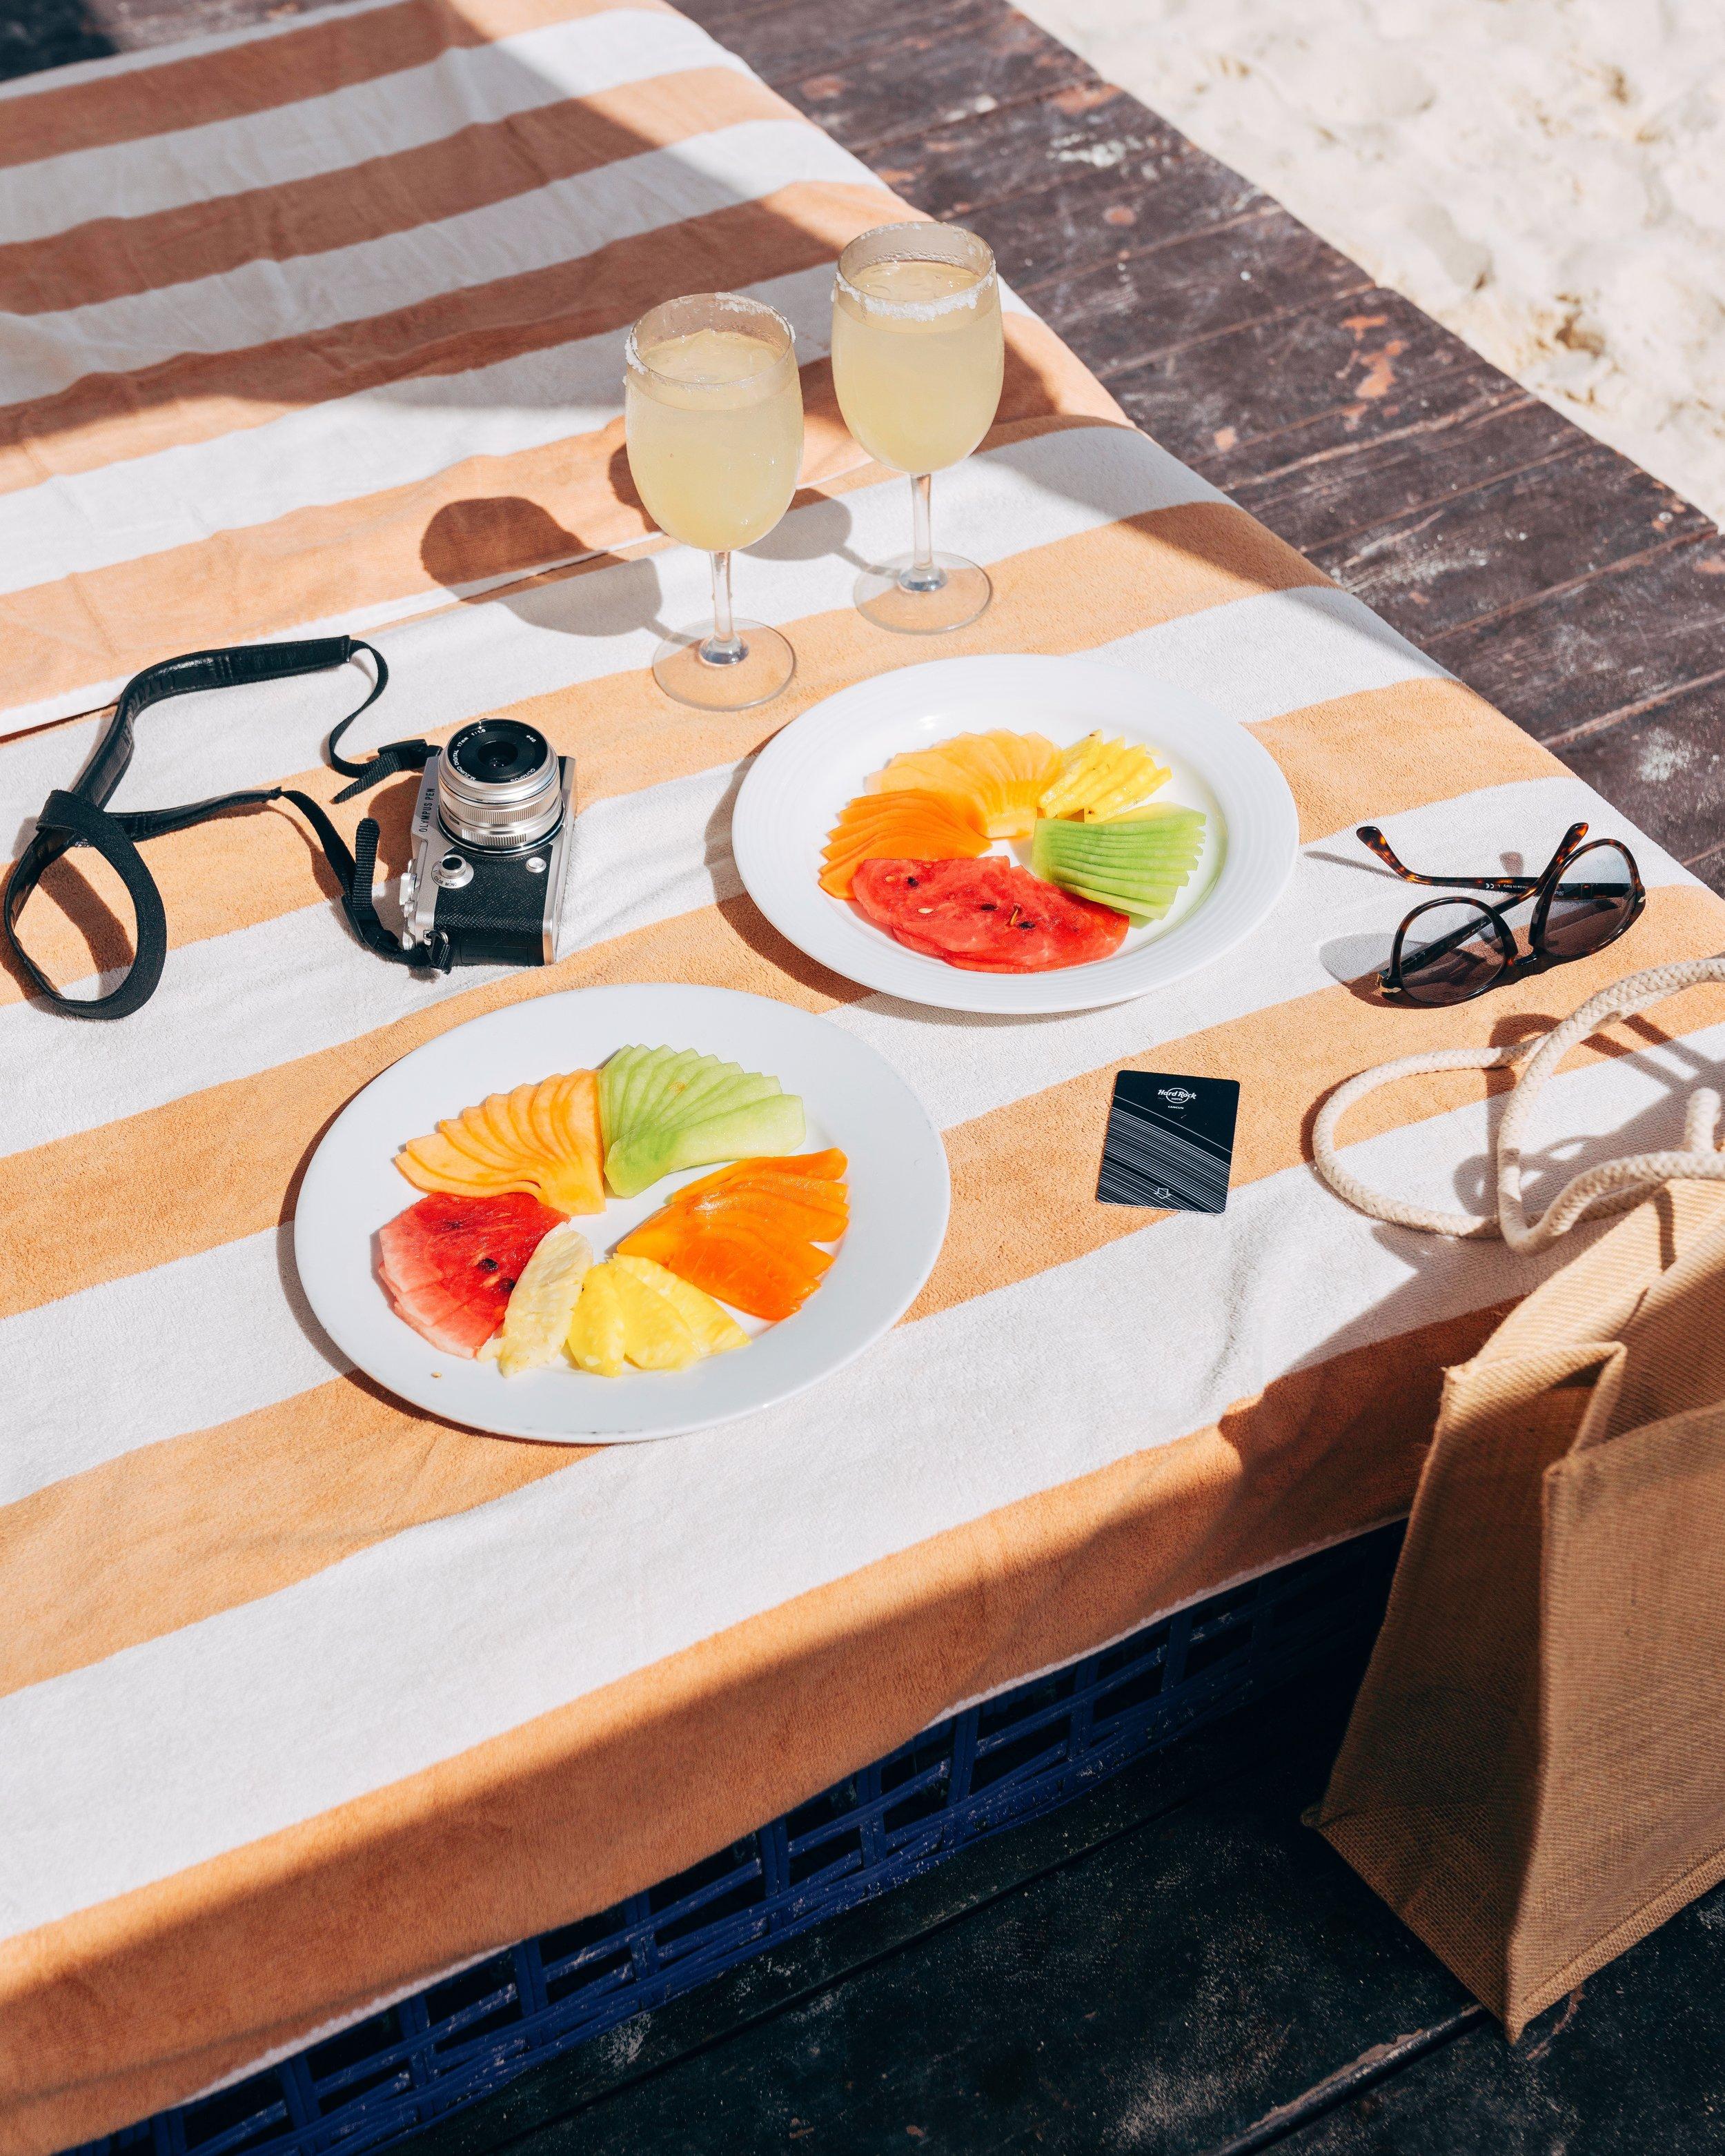 Margaritas and fruit plates -